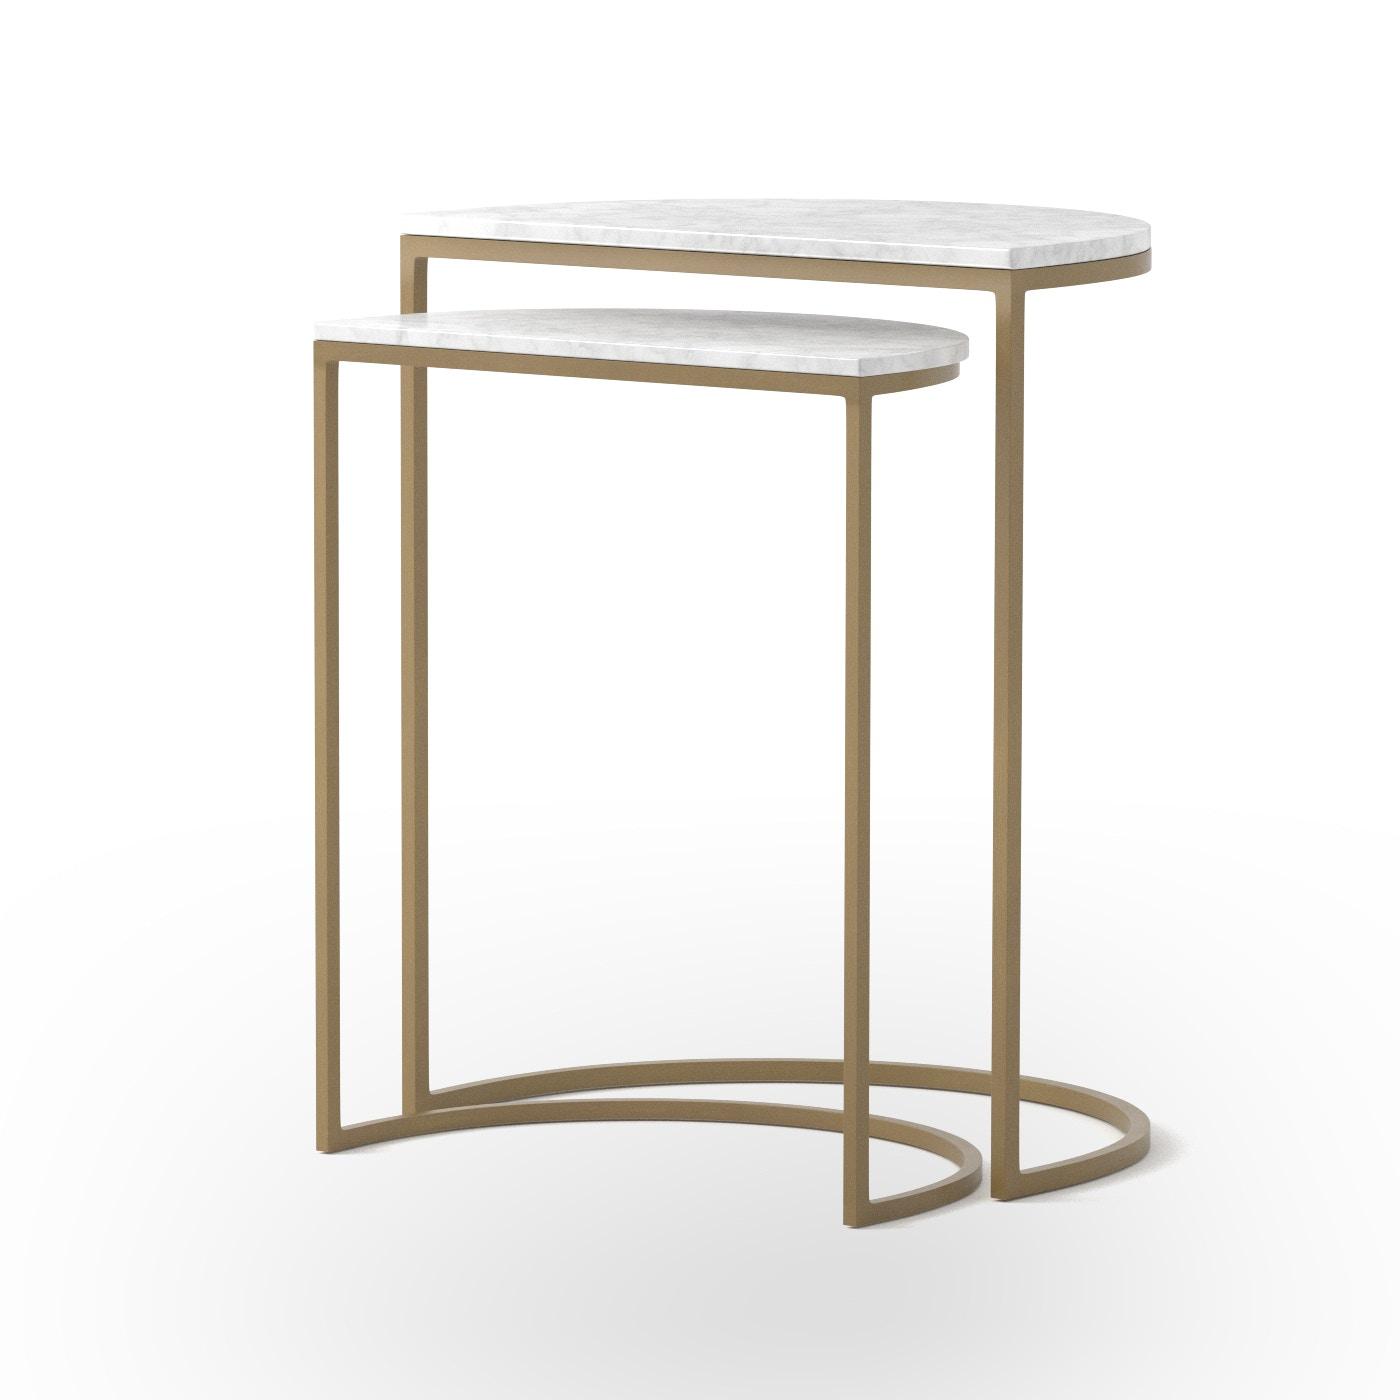 Four Hands Furniture IMAR88MBR Living Room Ane Nesting Tables